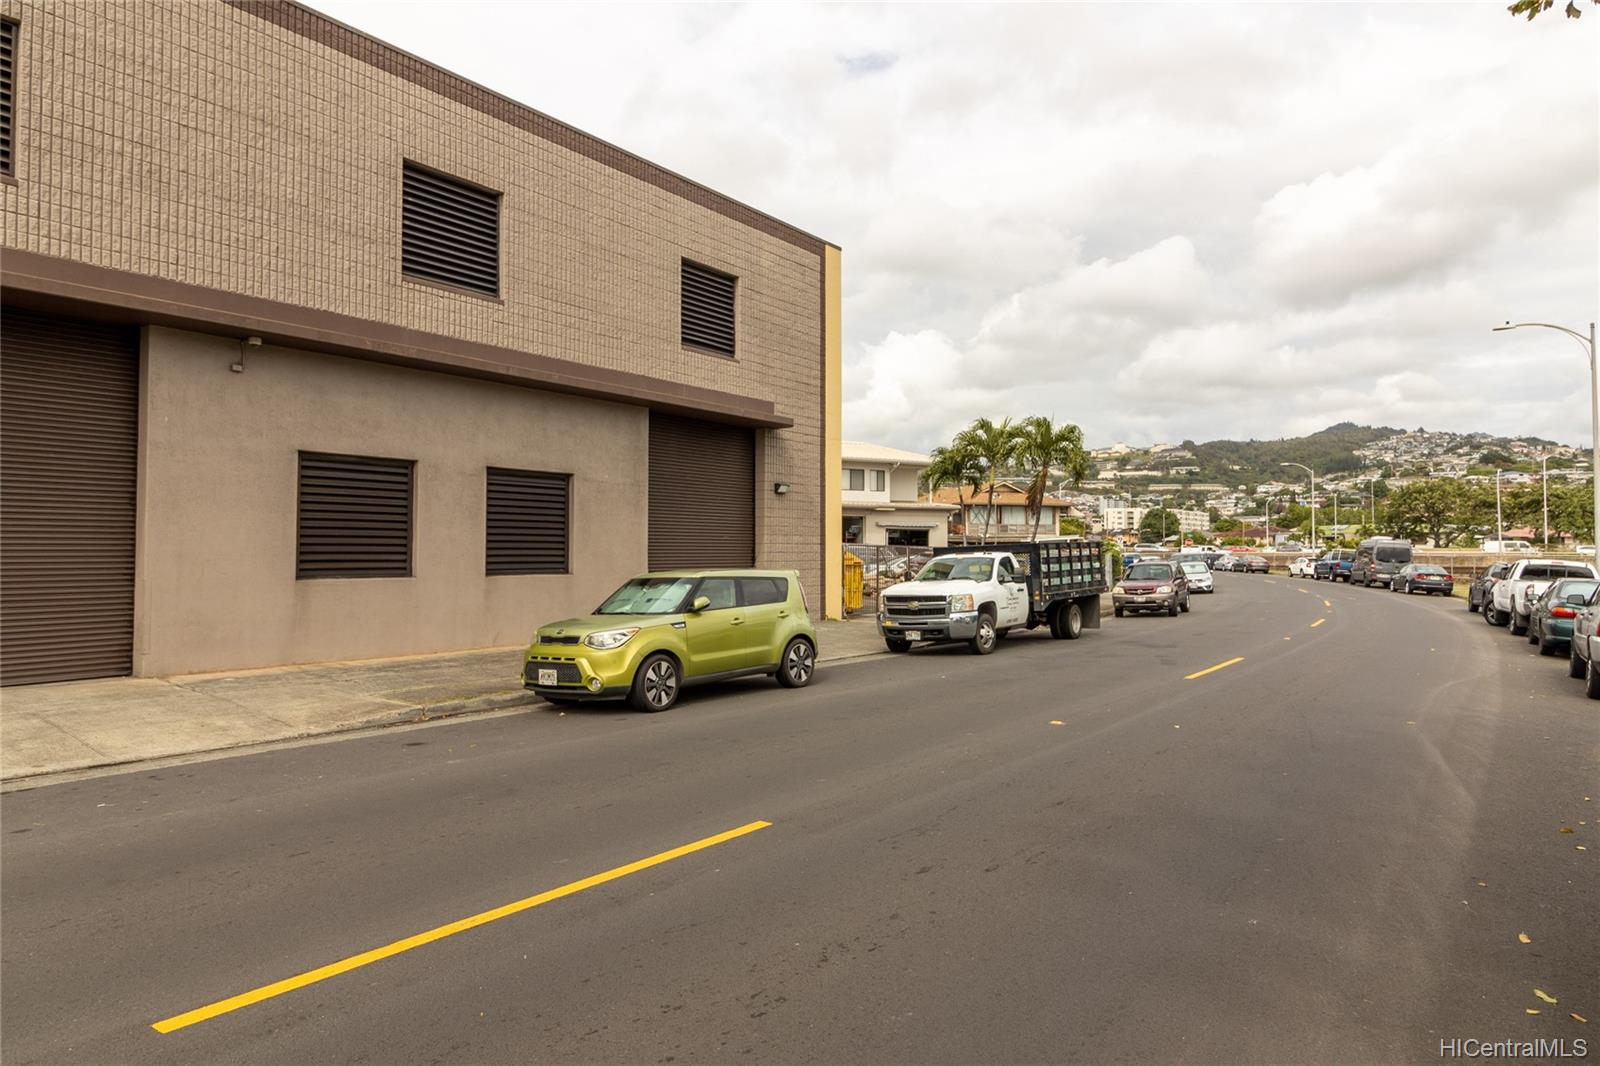 1030 Kohou Street Honolulu Oahu commercial real estate photo24 of 25